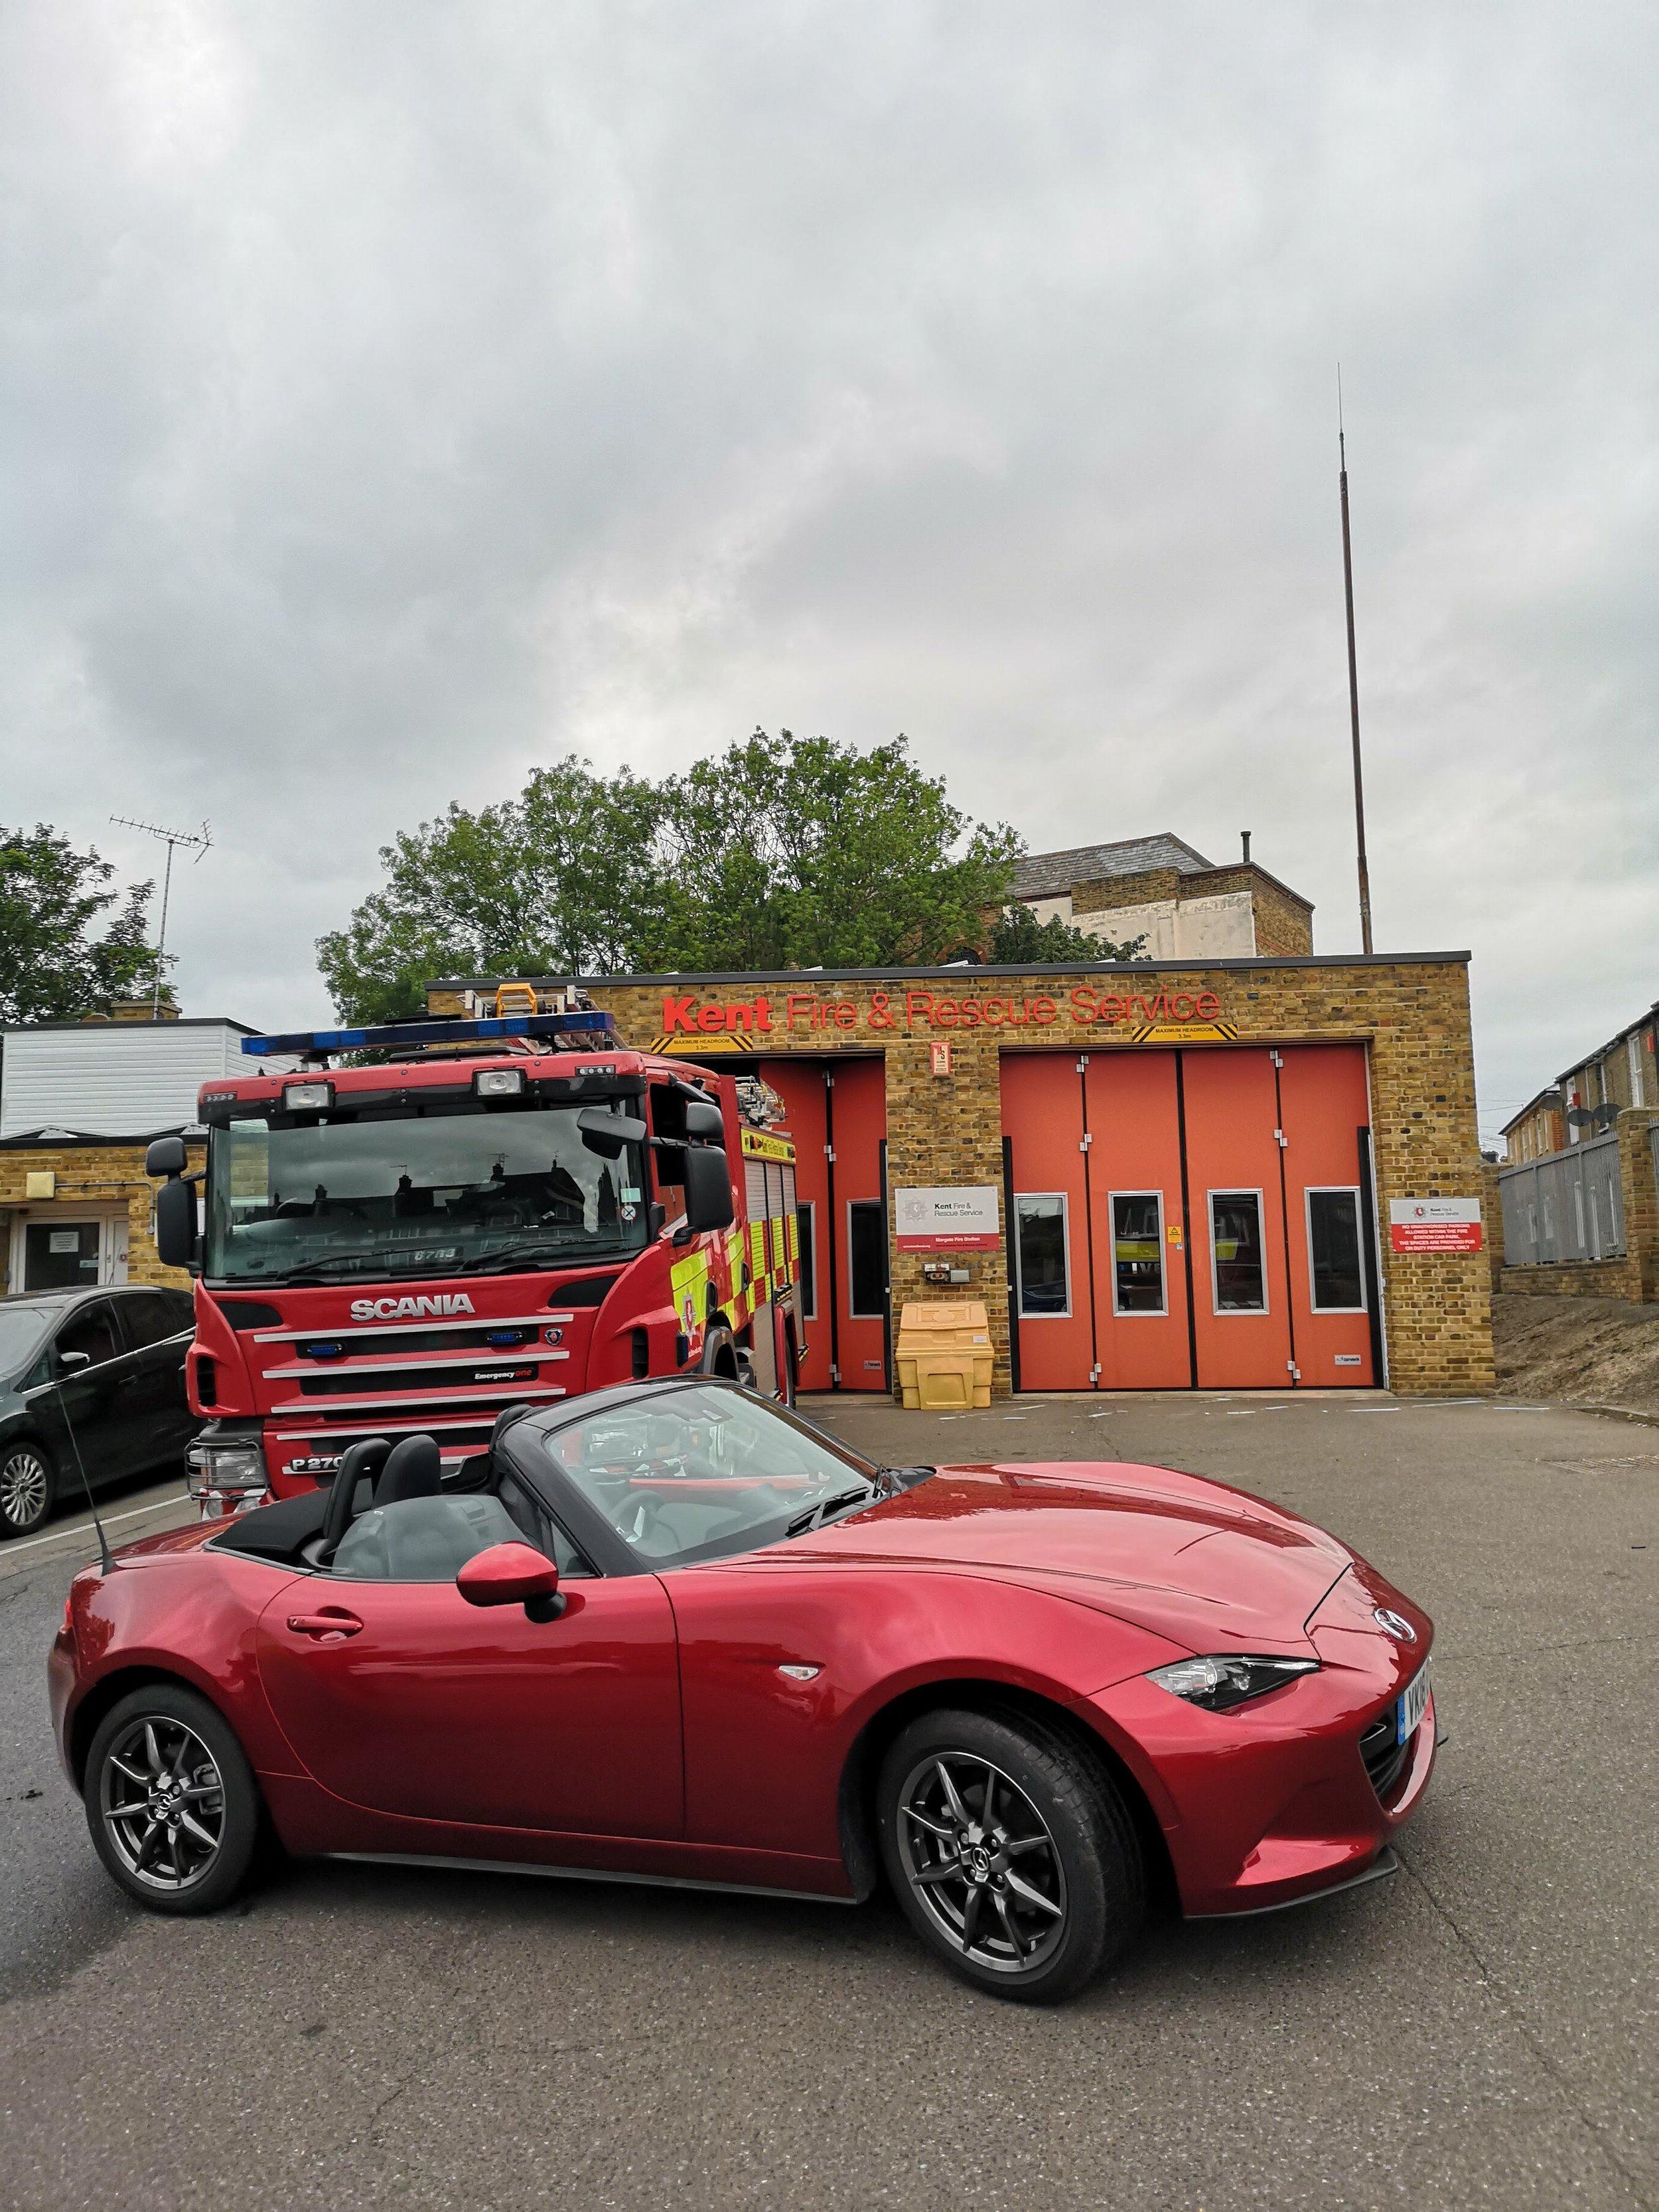 Margate Fire Station